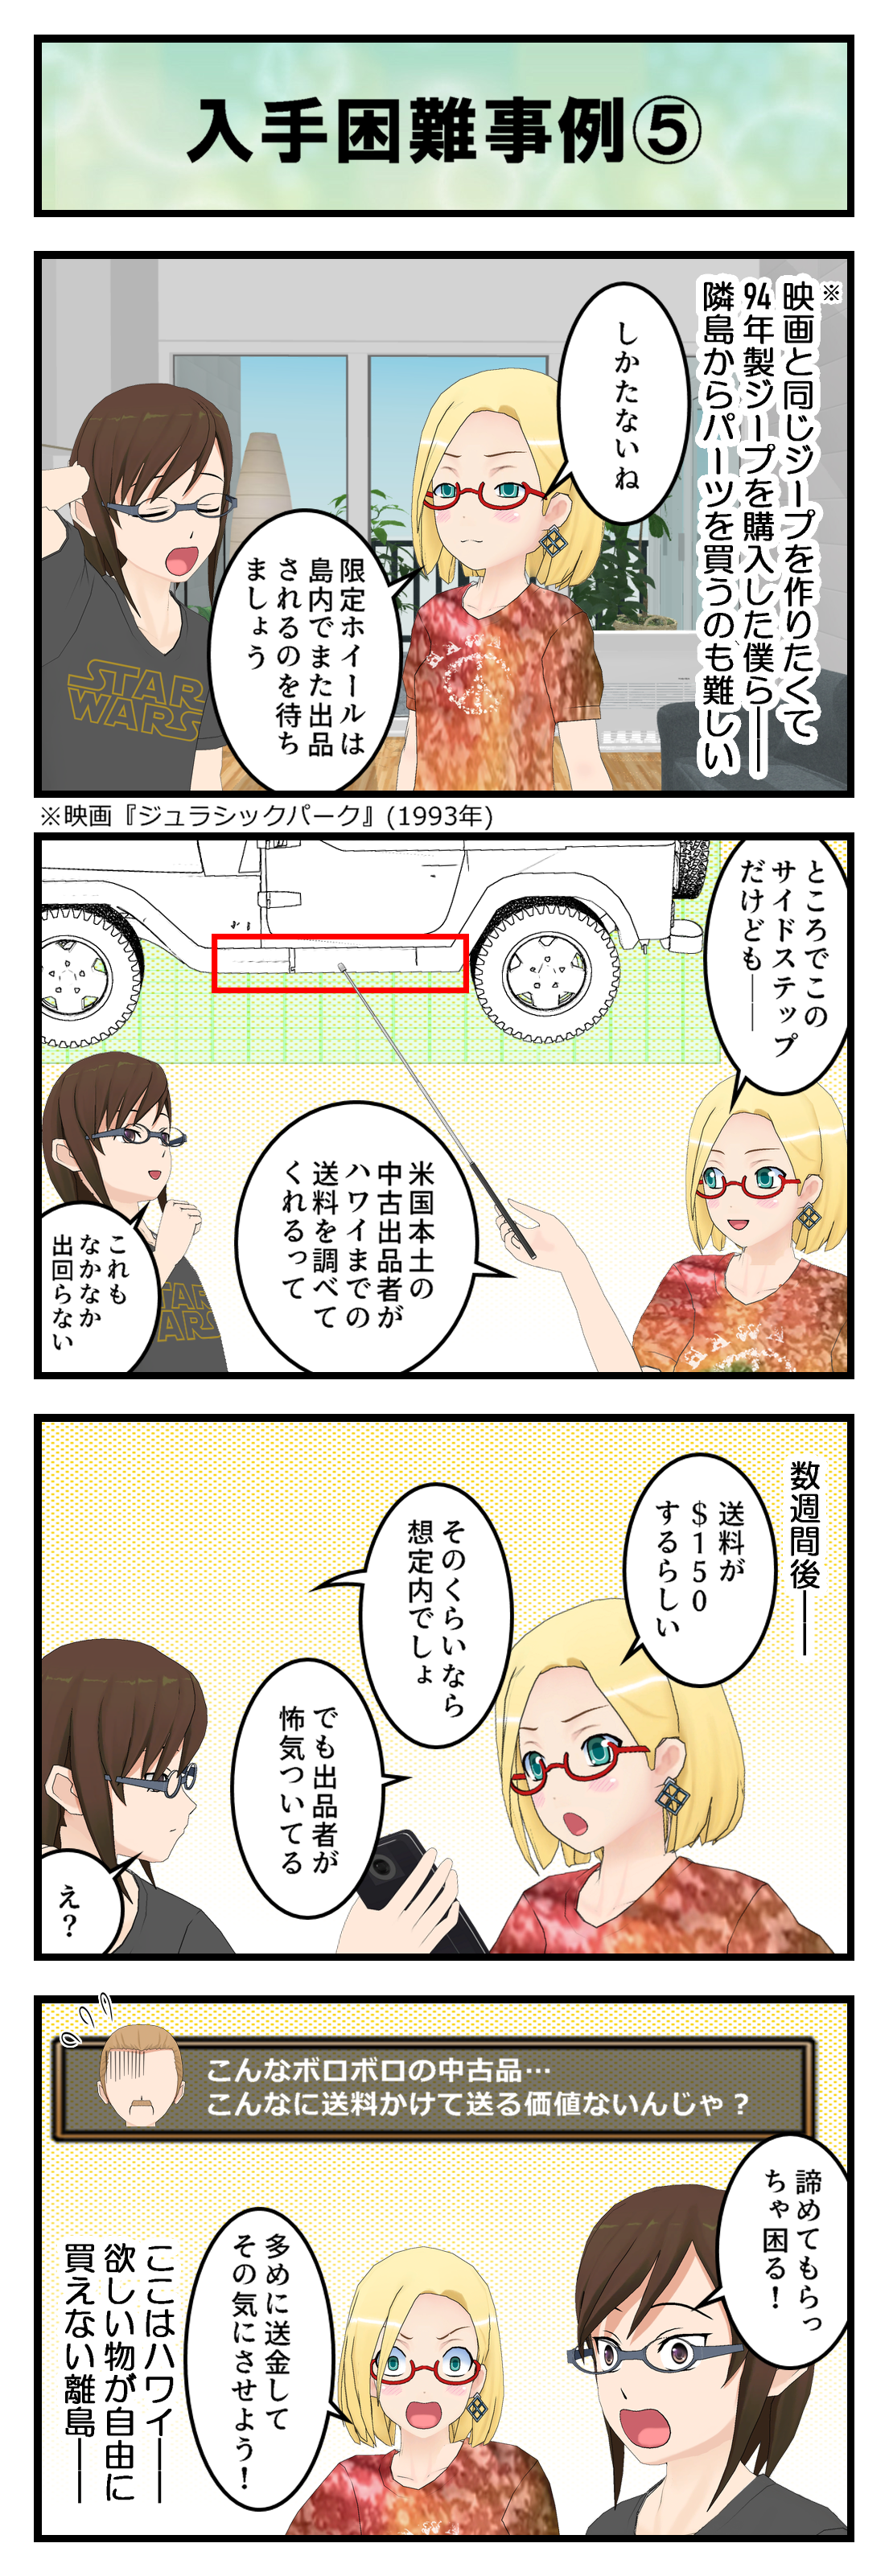 R726_入手困難事例5_001